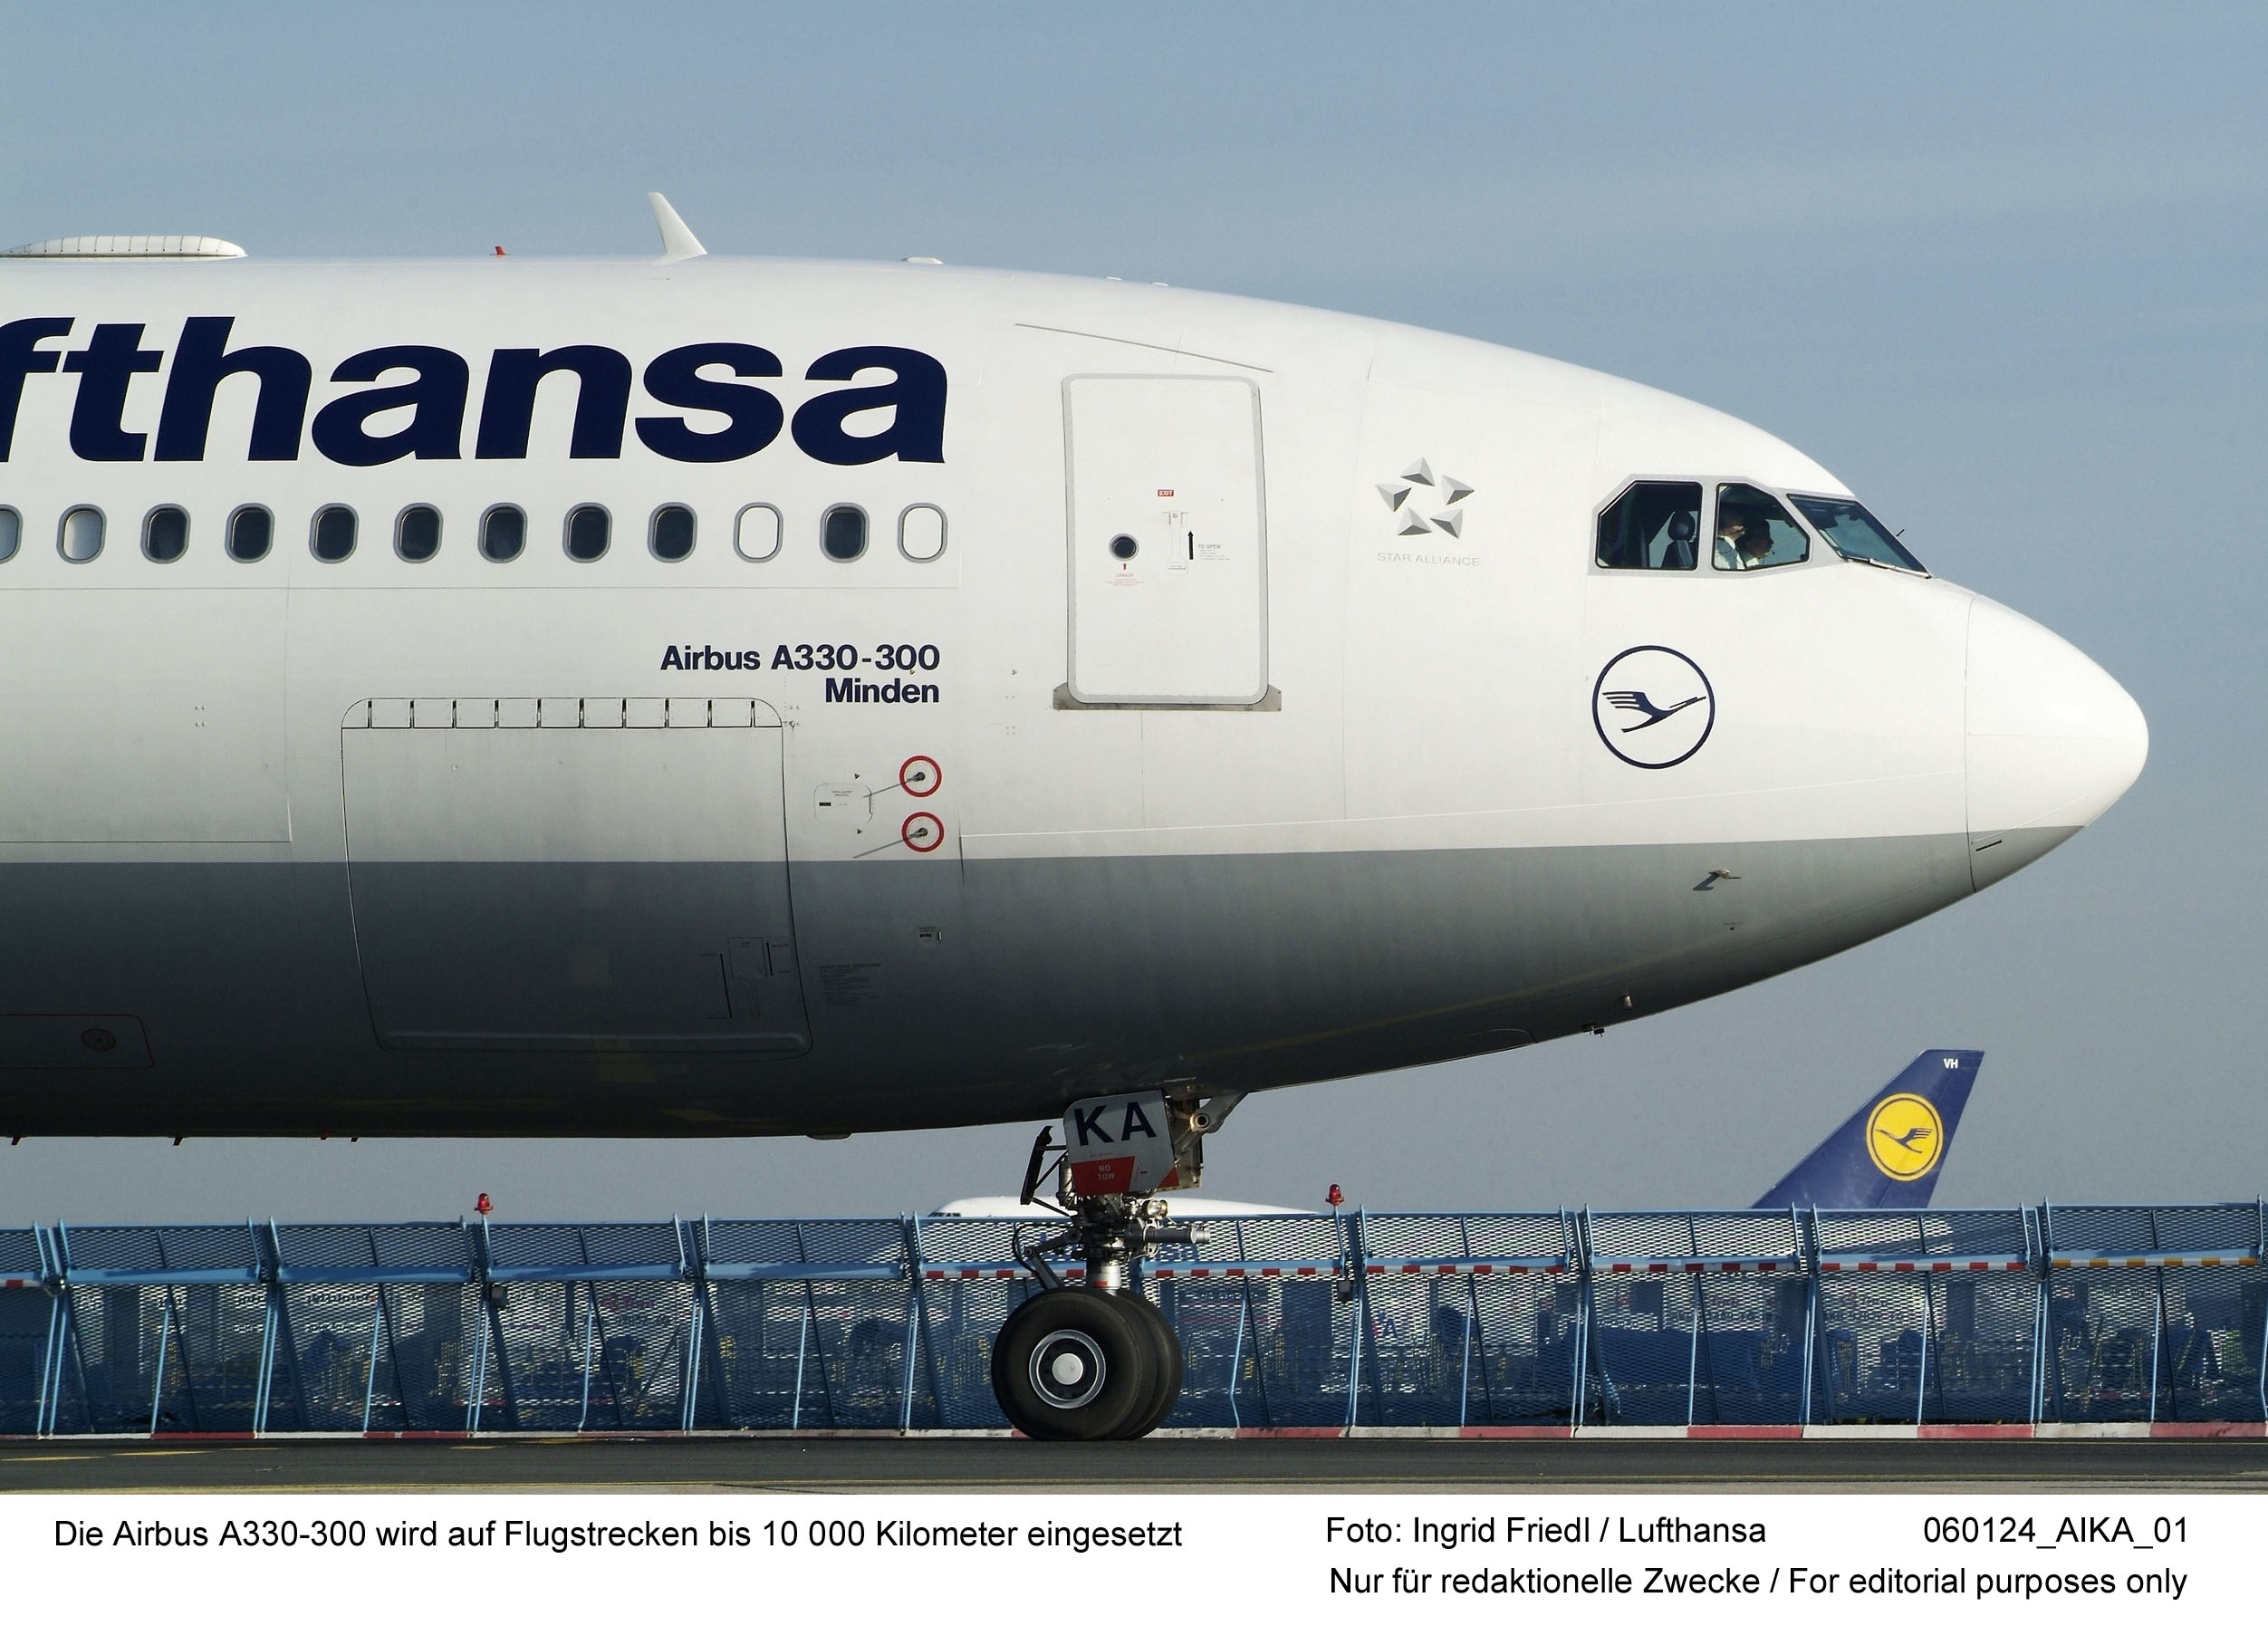 Lufthansa Airbus A330-300 (Foto: Ingrid Friedl Lufthansa: 01.2006 060124_AIKA_01)